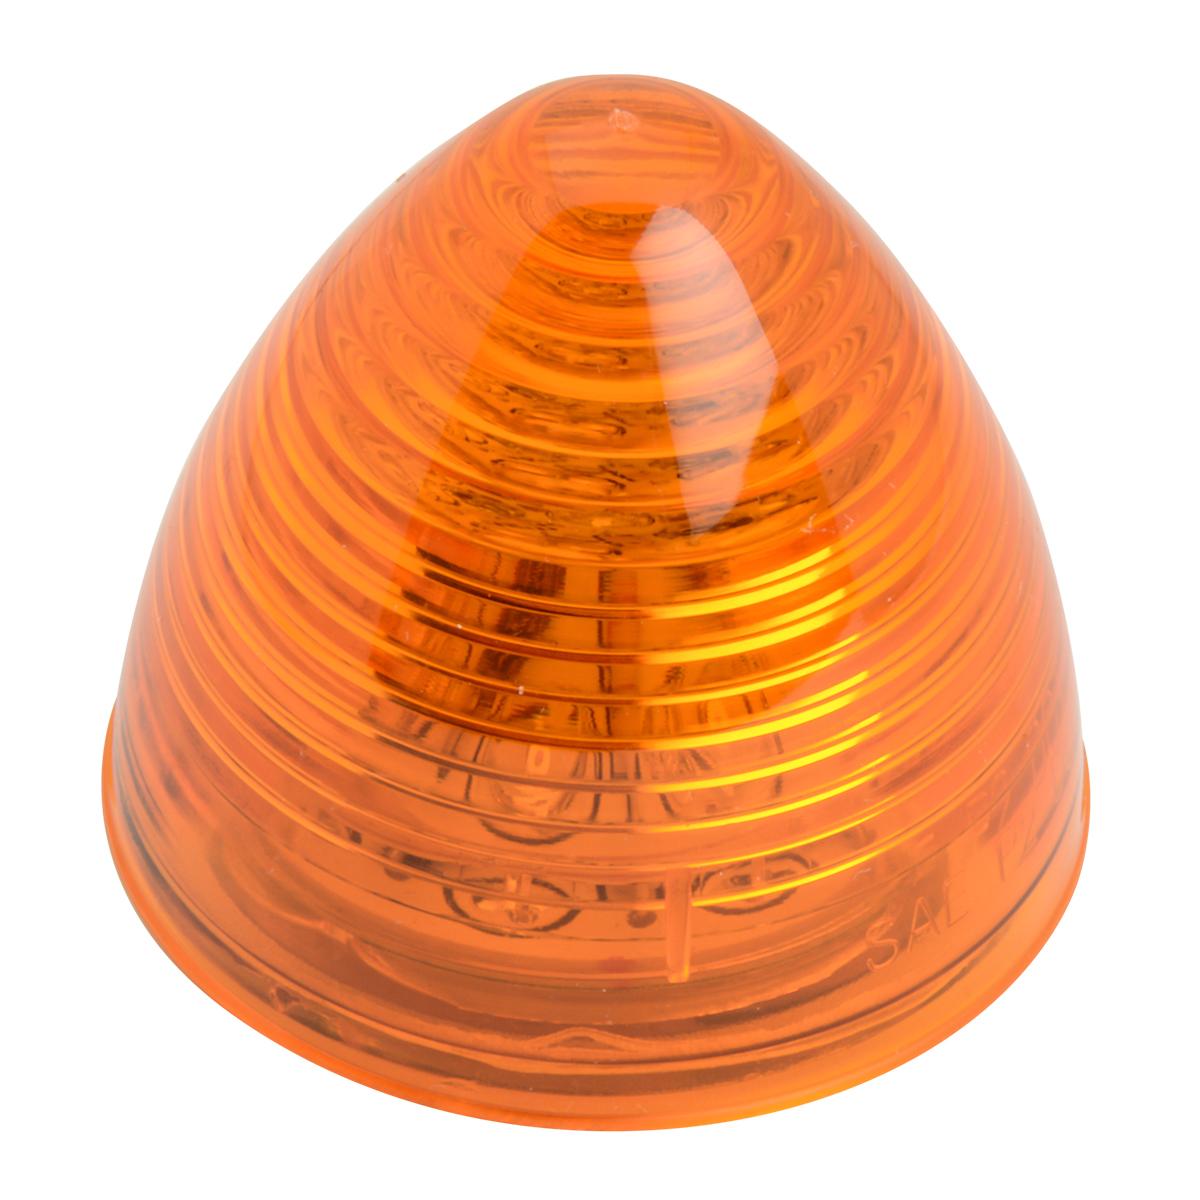 79270 Beehive LED Marker Light in Amber/Amber